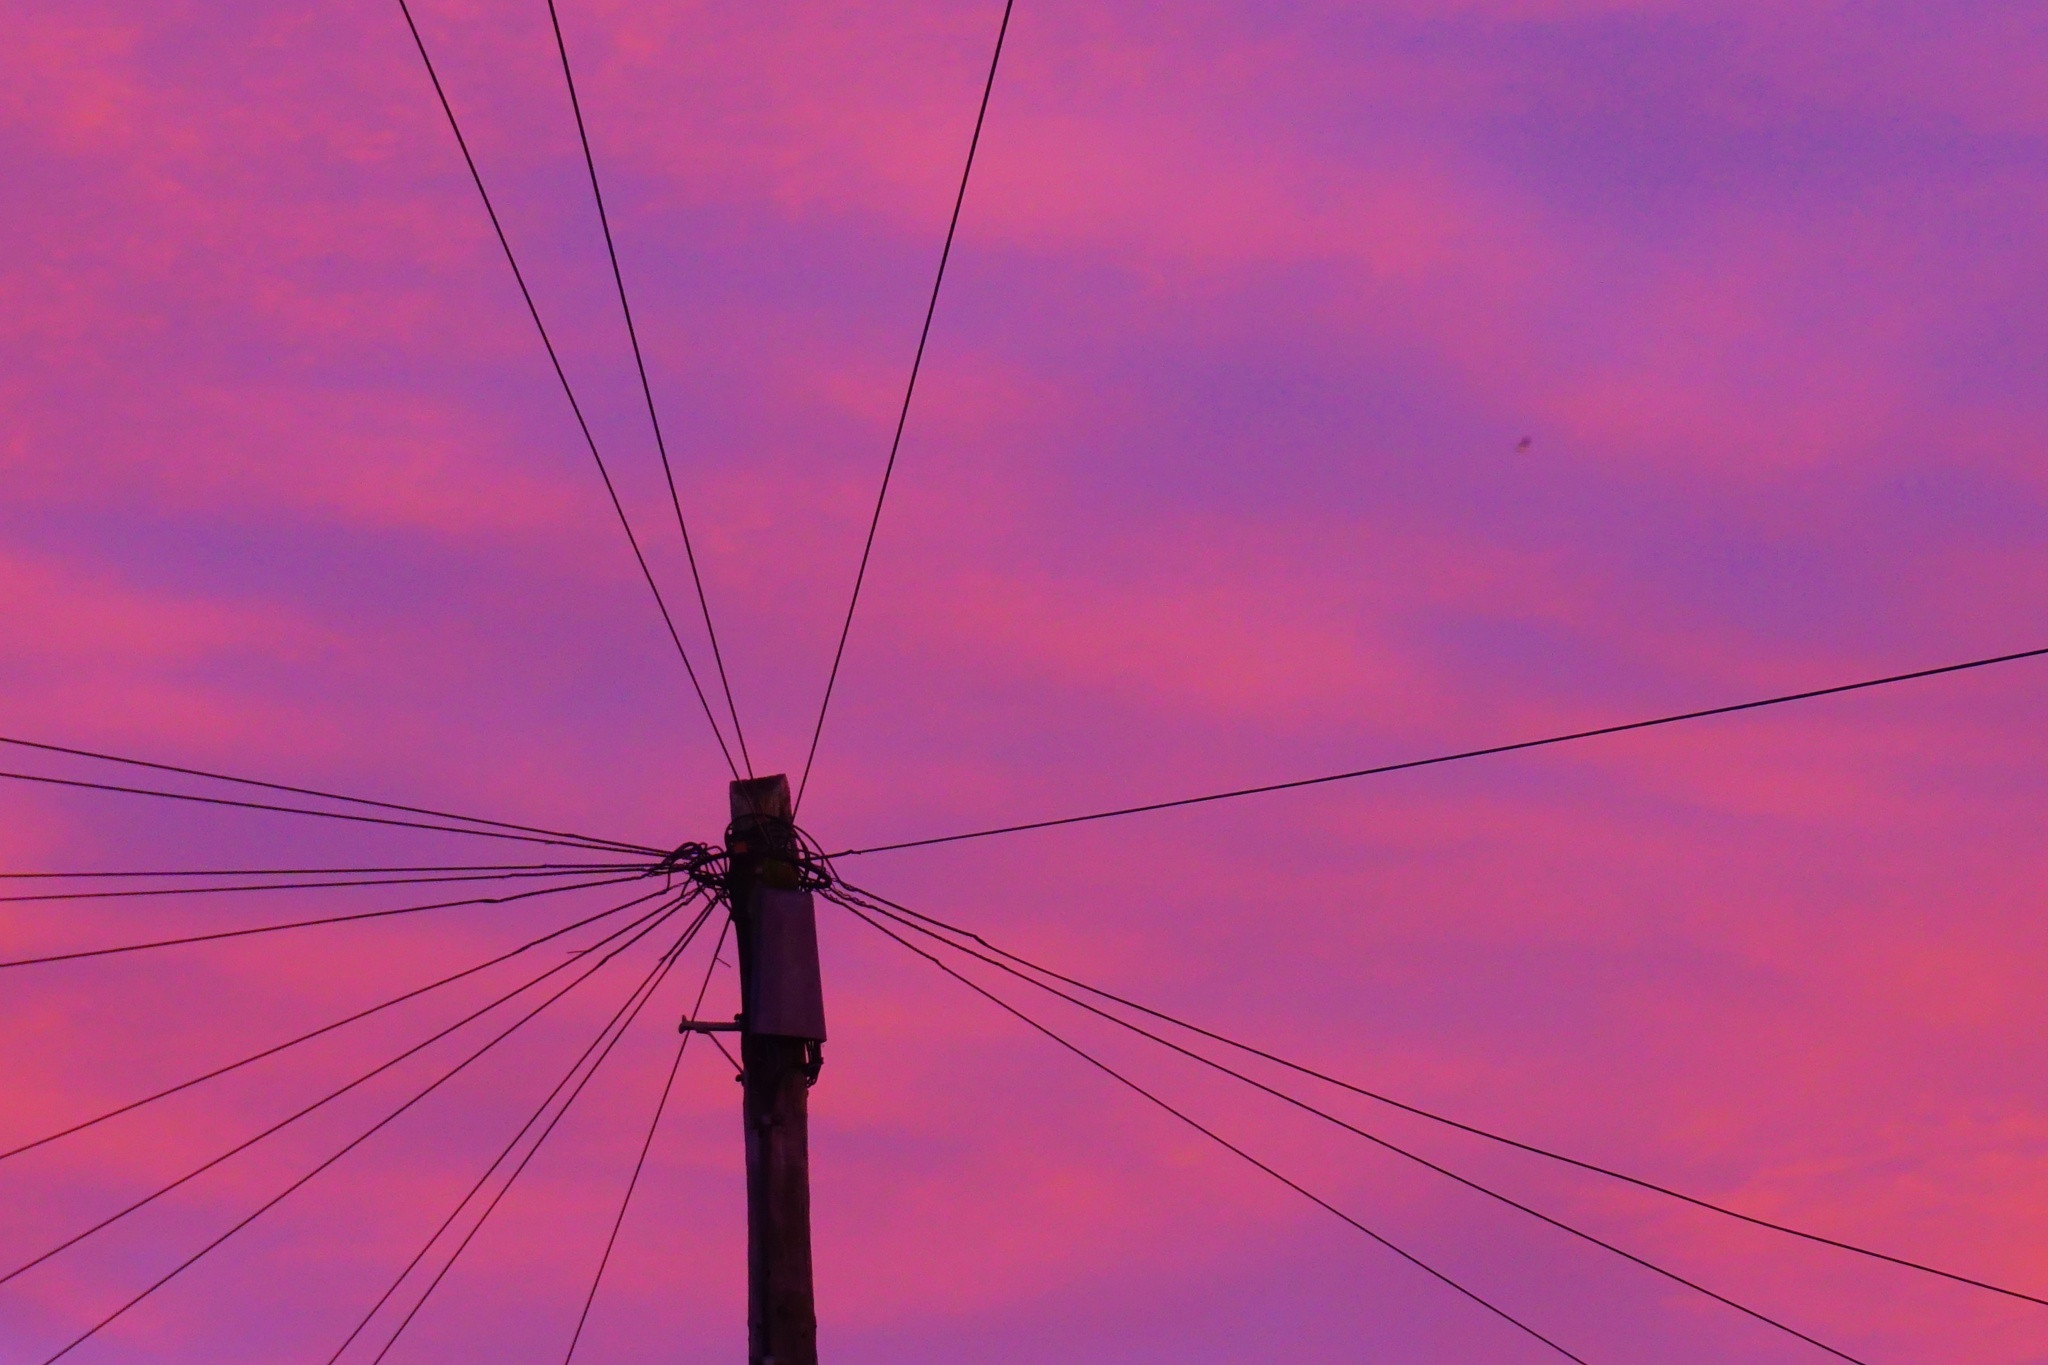 Wired sunrise by AJ Yakstrangler Andy Jamieson